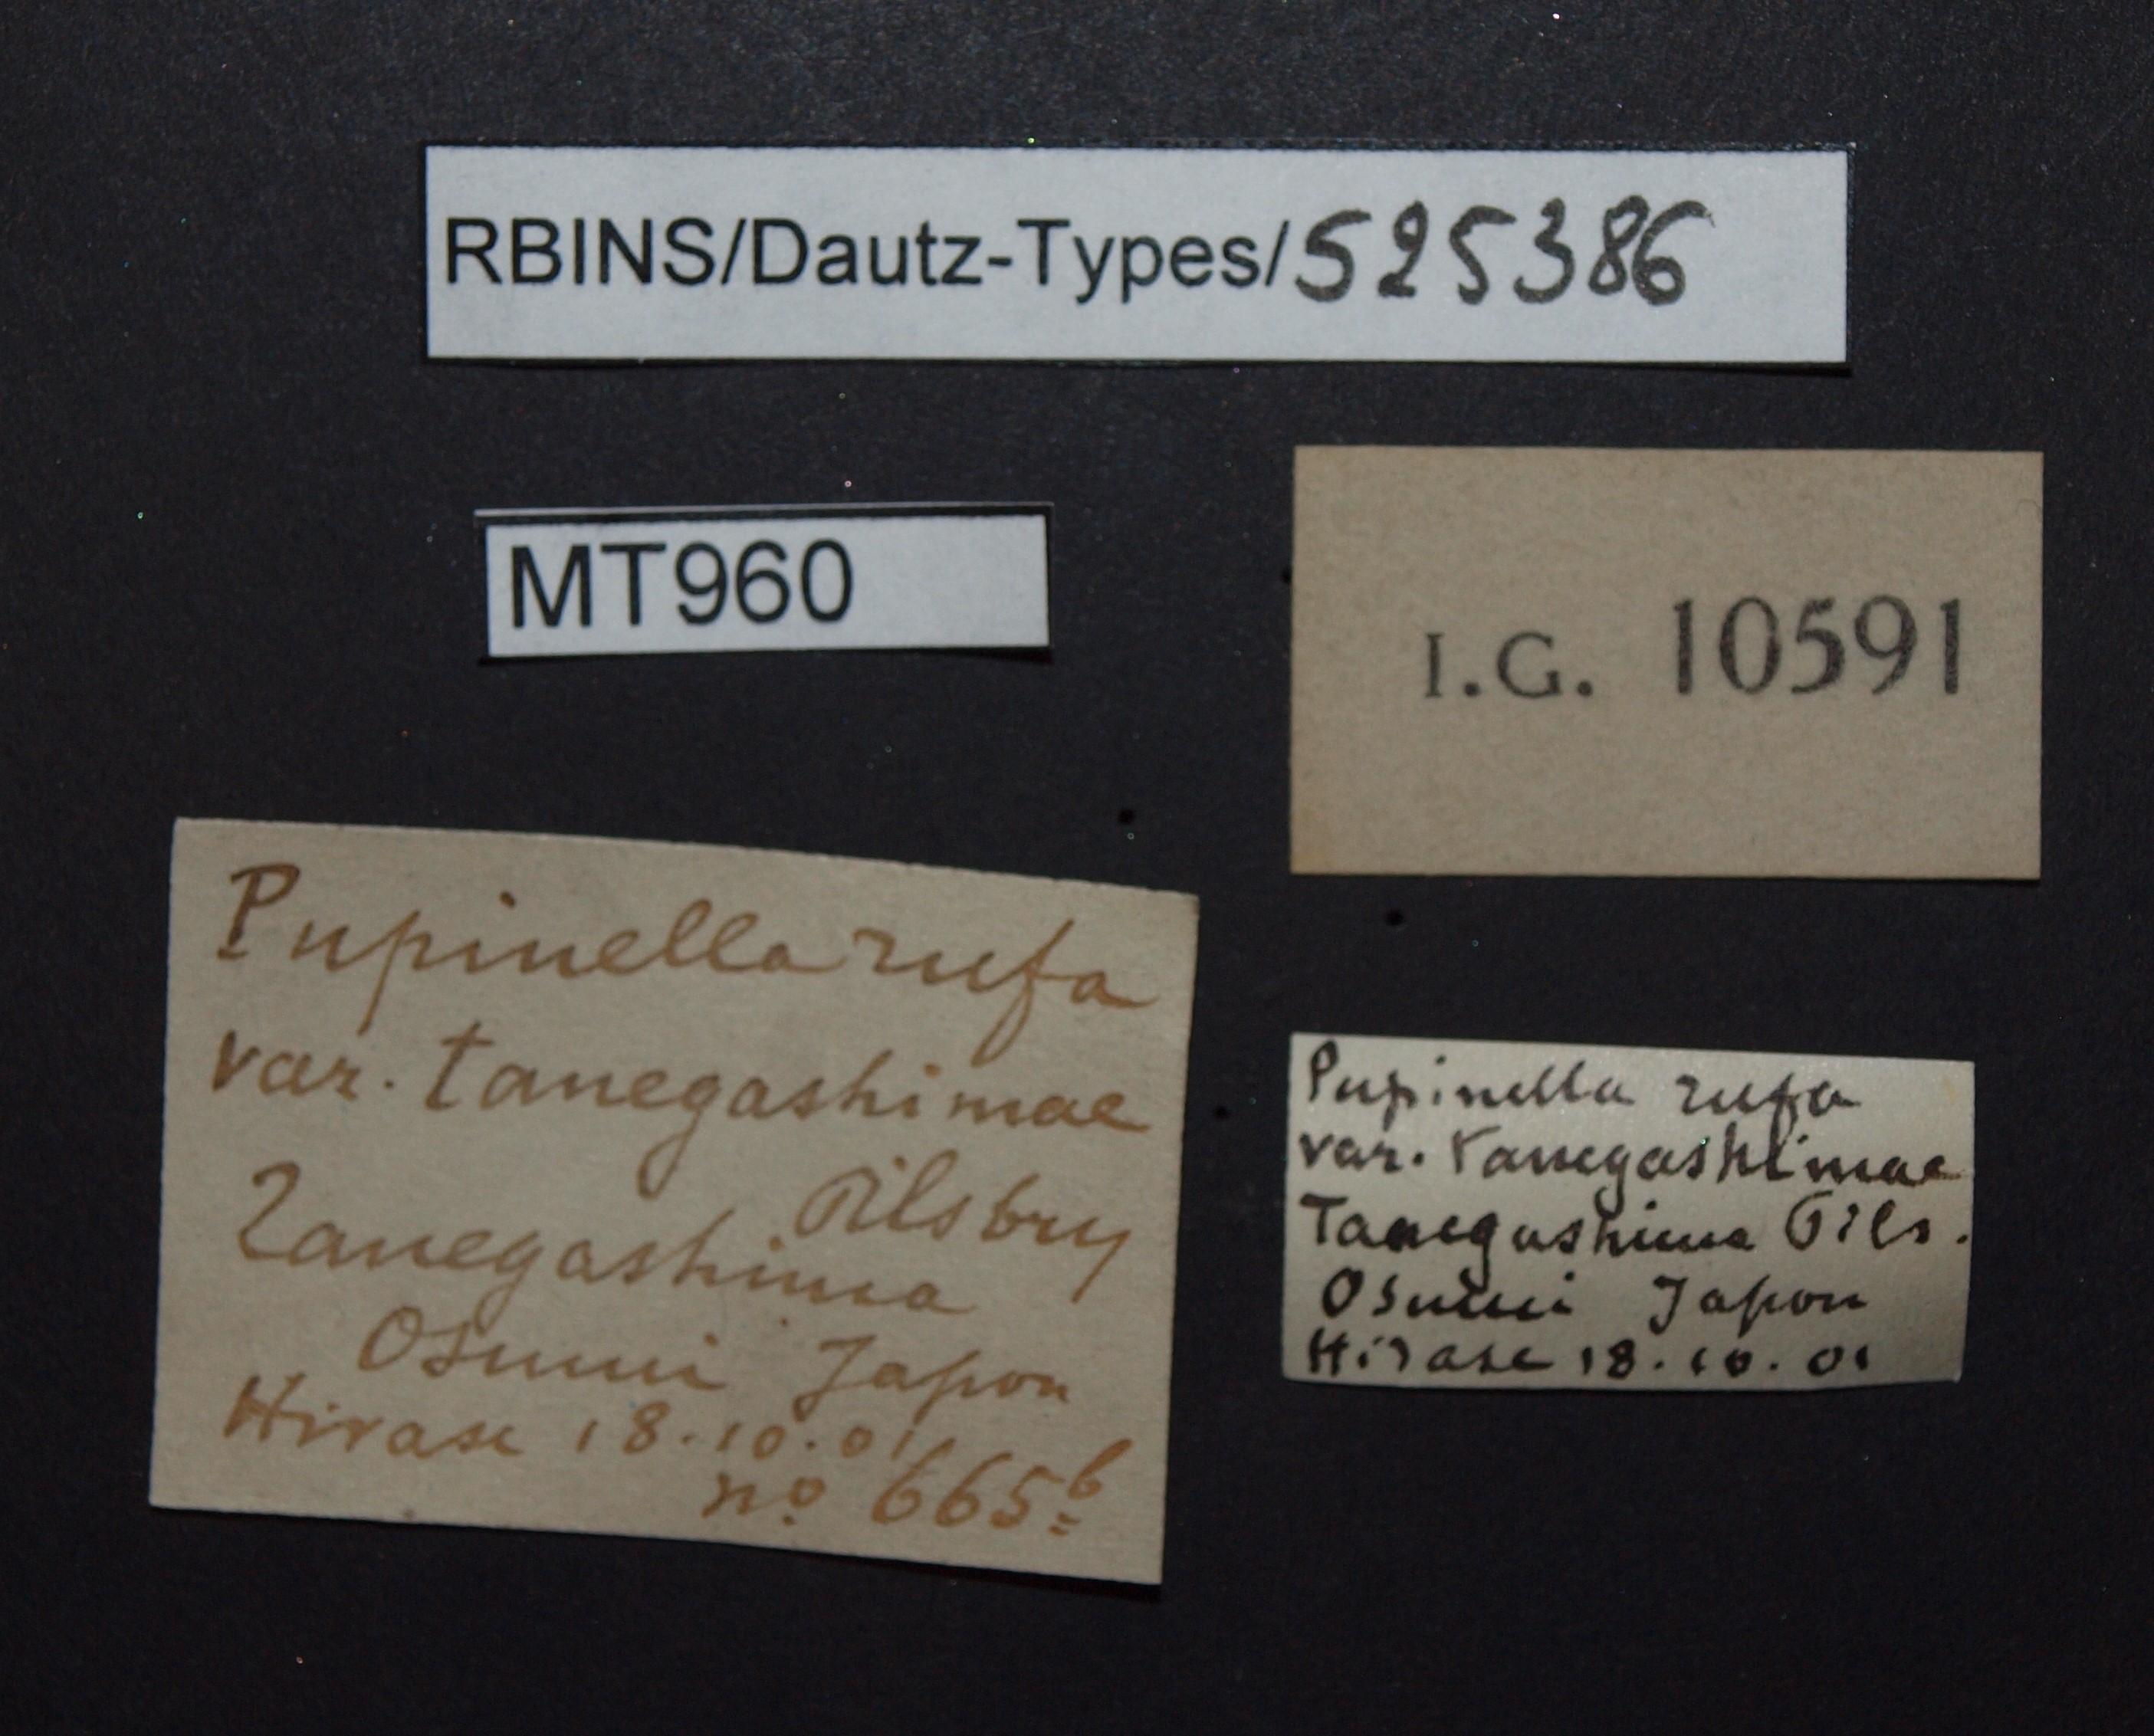 BE-RBINS-INV MT 960 Pupinella (Pupinopsis) rufa var. tanegashimae pt Lb.jpg